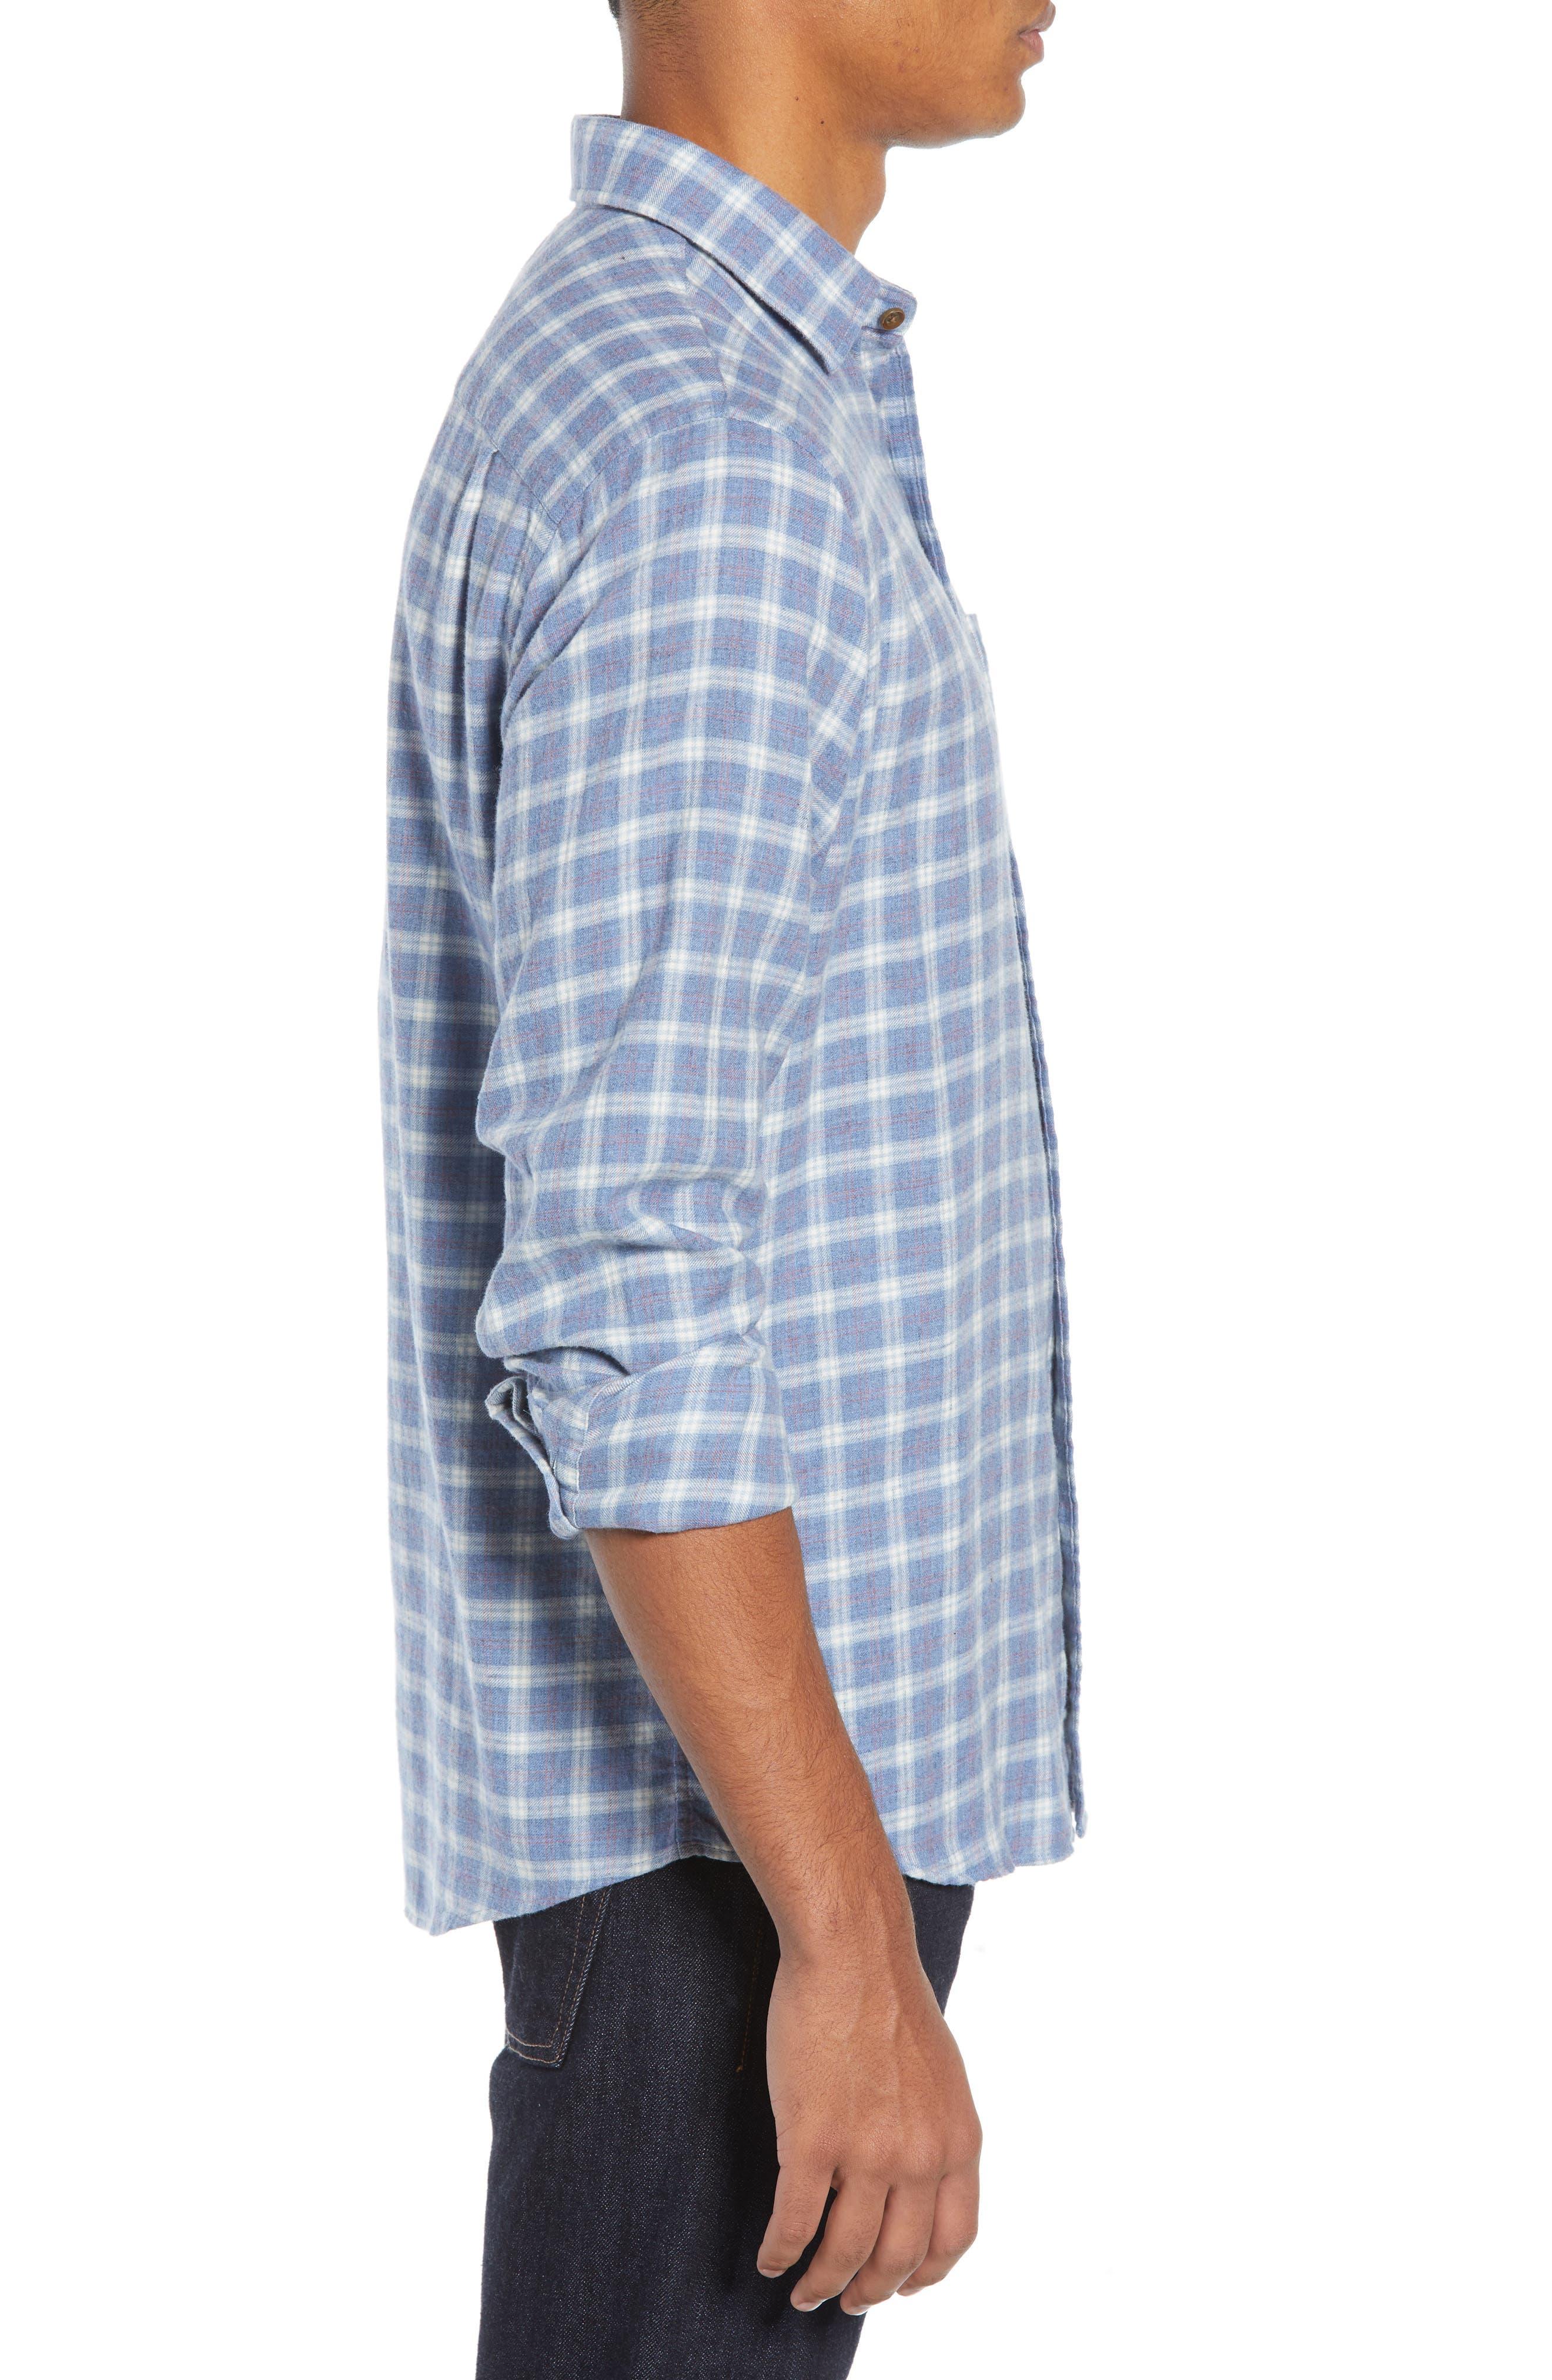 Ventura Oxford Sport Shirt,                             Alternate thumbnail 4, color,                             HEATHER BLUE CHECK